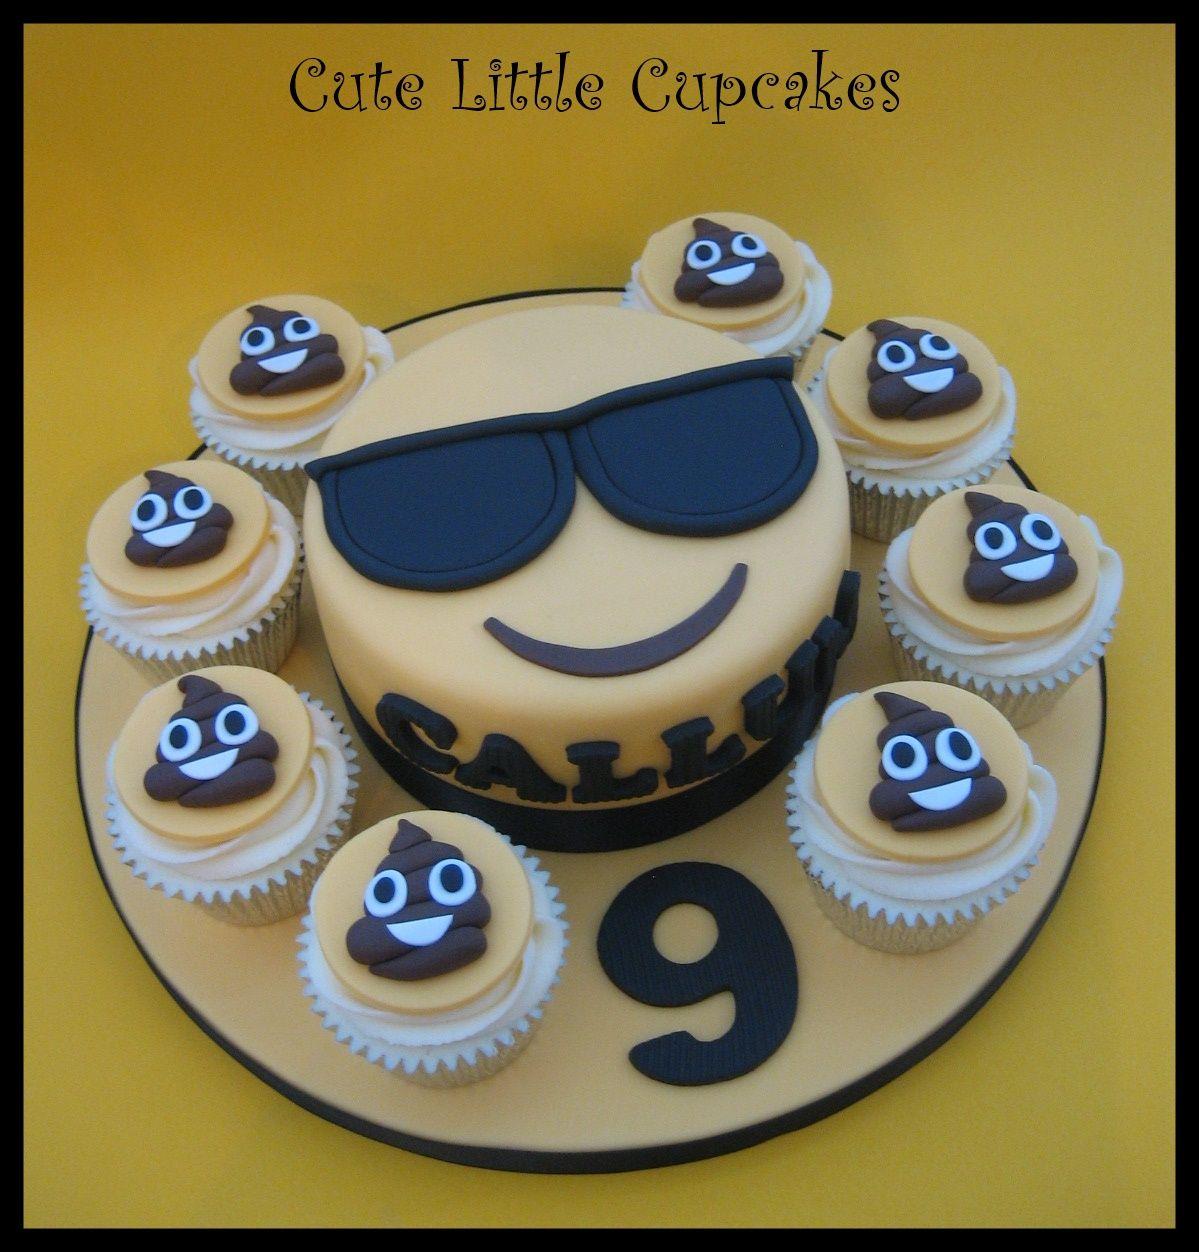 6 Classic Vanilla Sunglasses Emoji cake set on an extra large